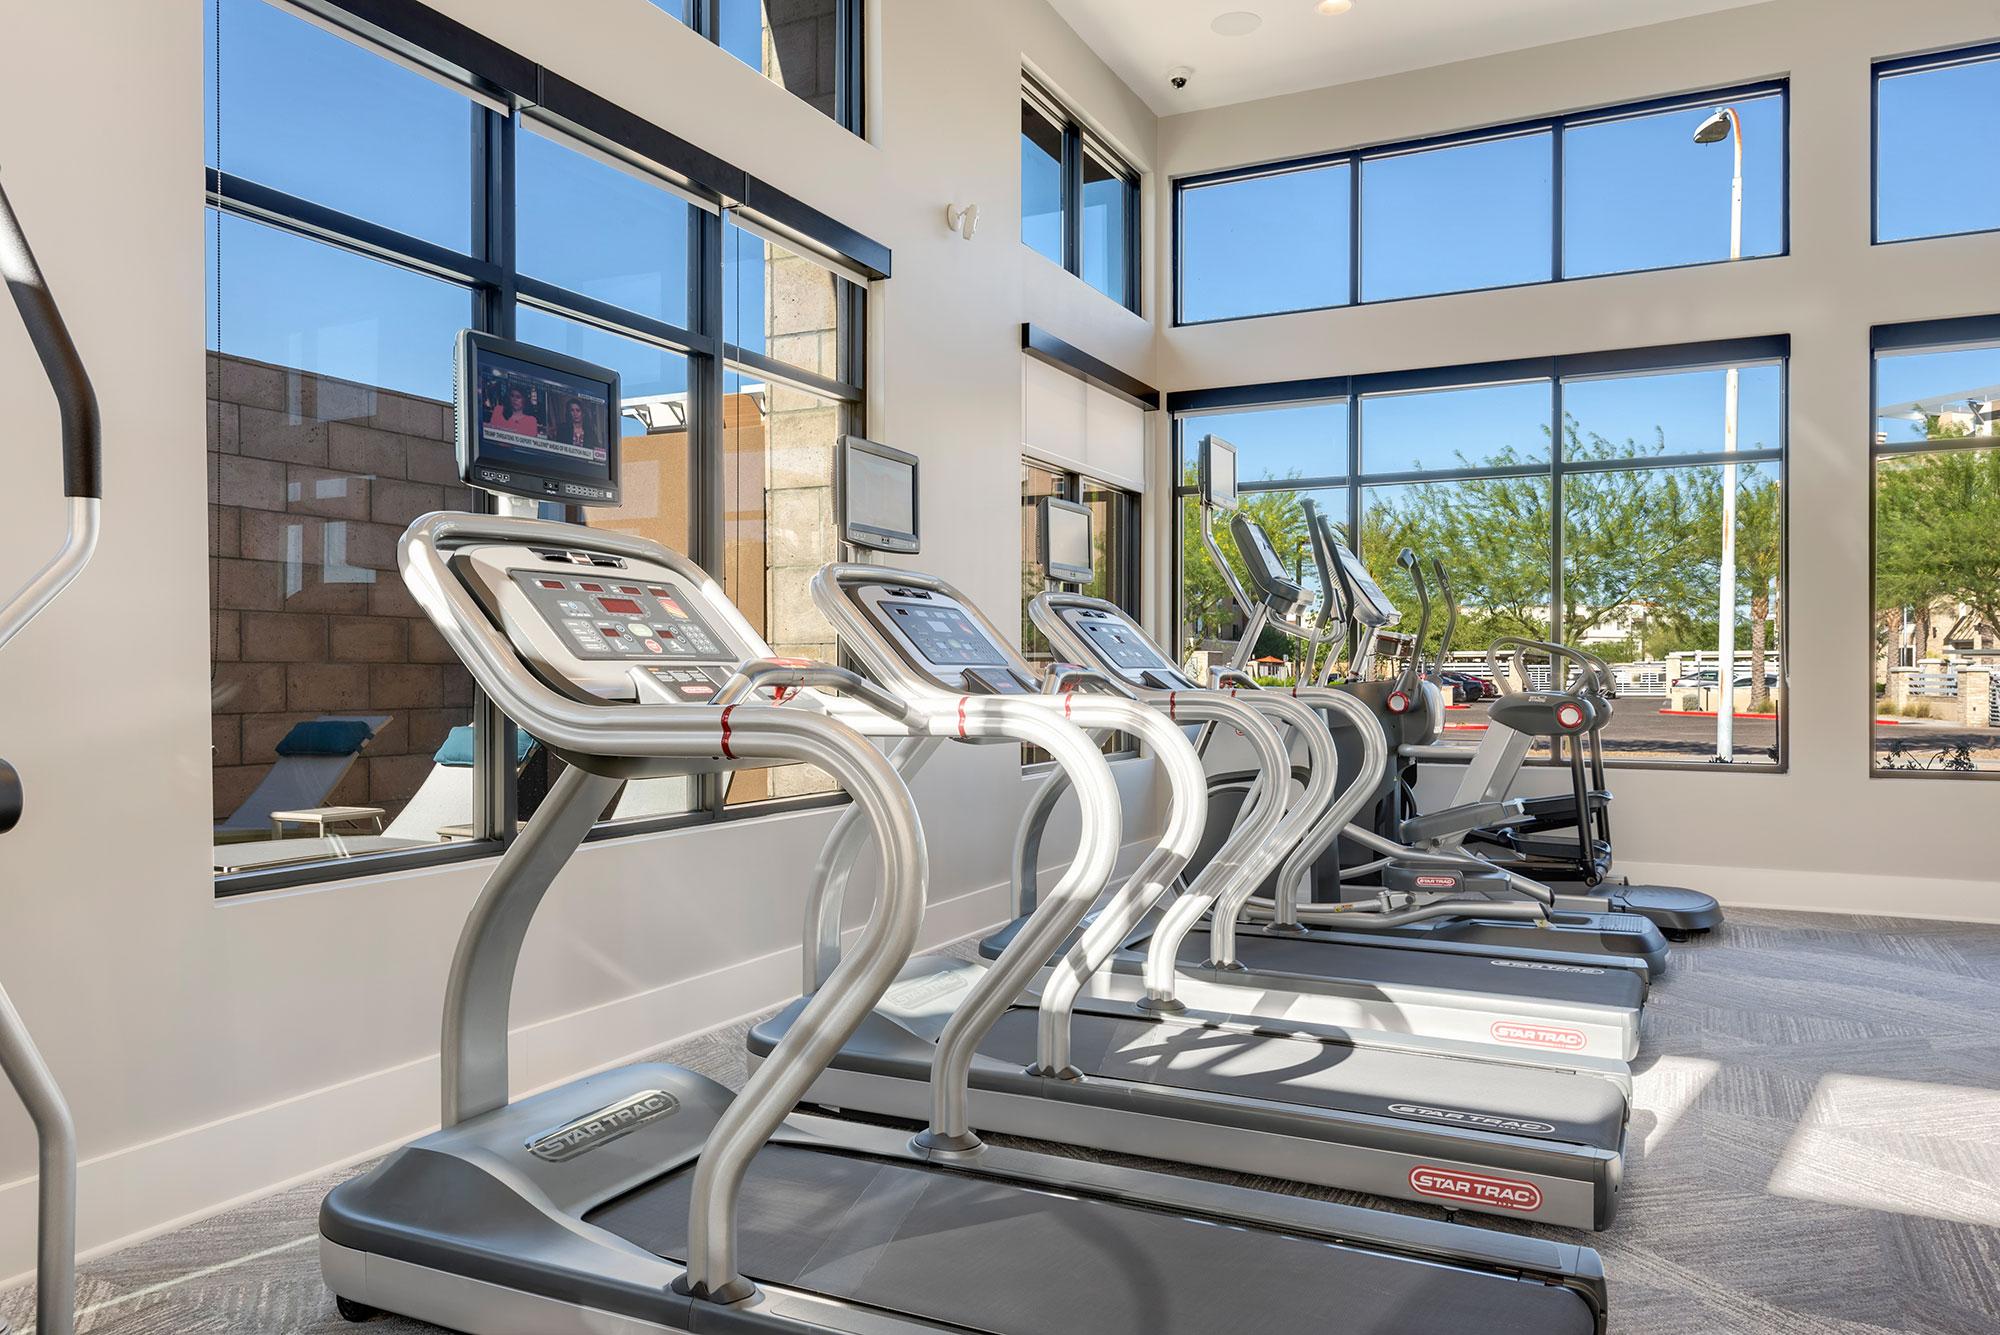 Riata - Fitness room with treadmills